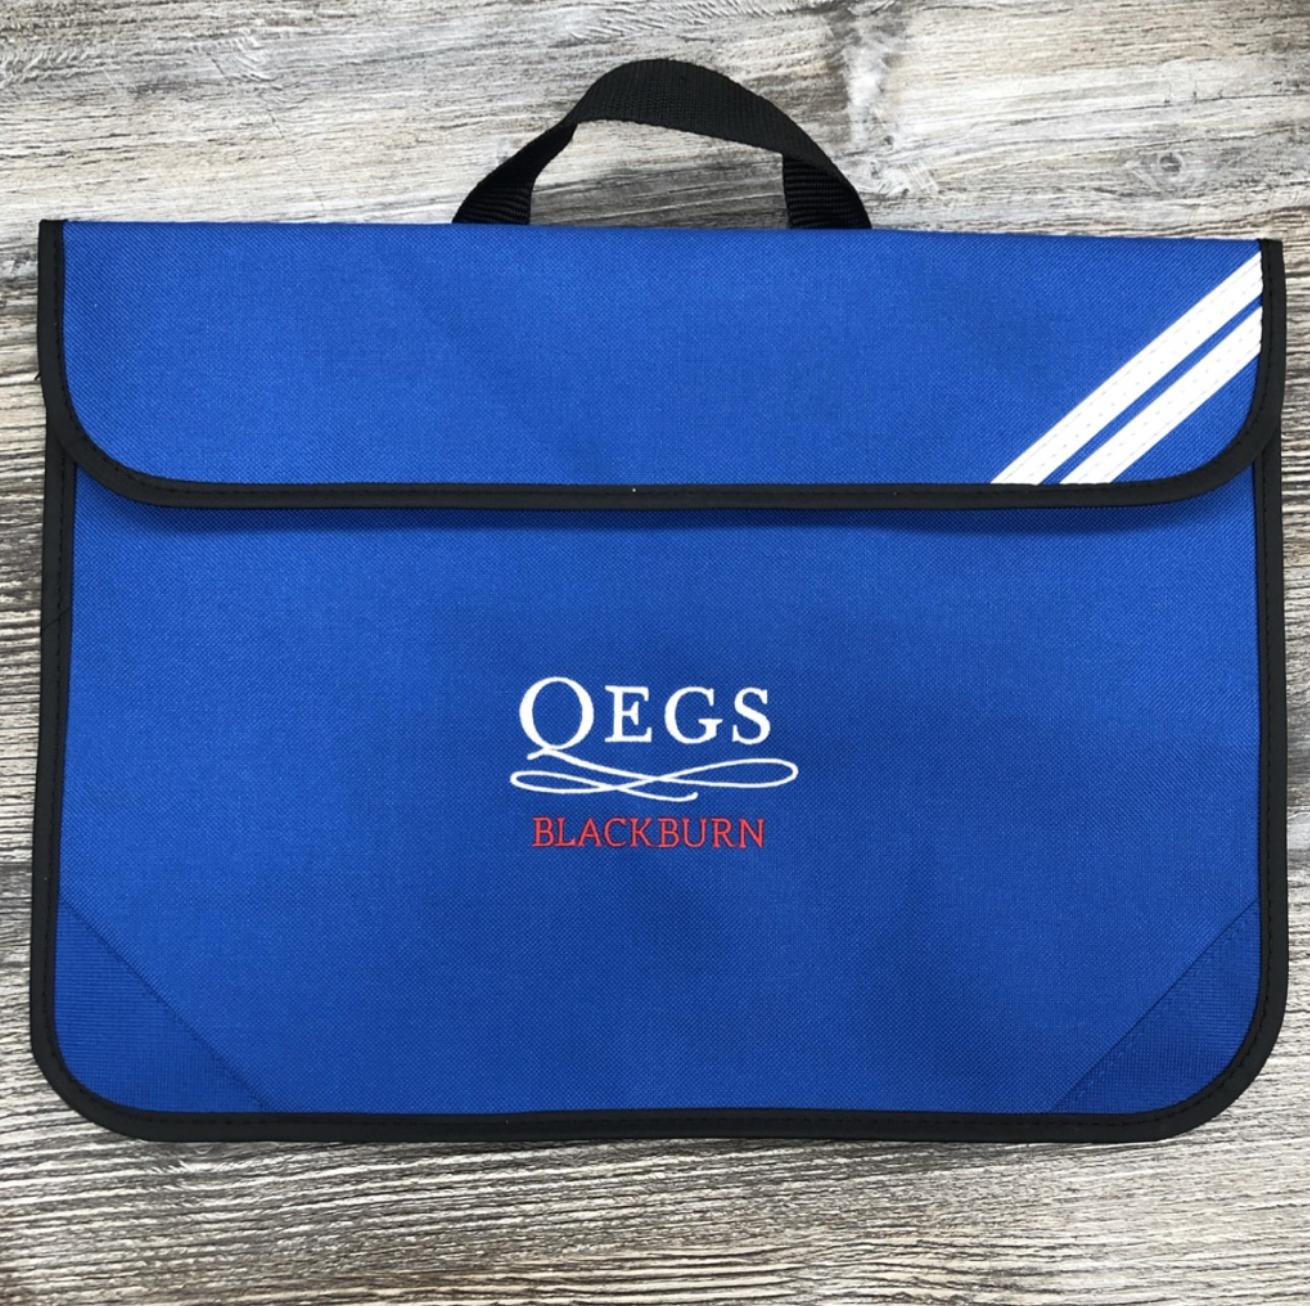 QEGS Bags